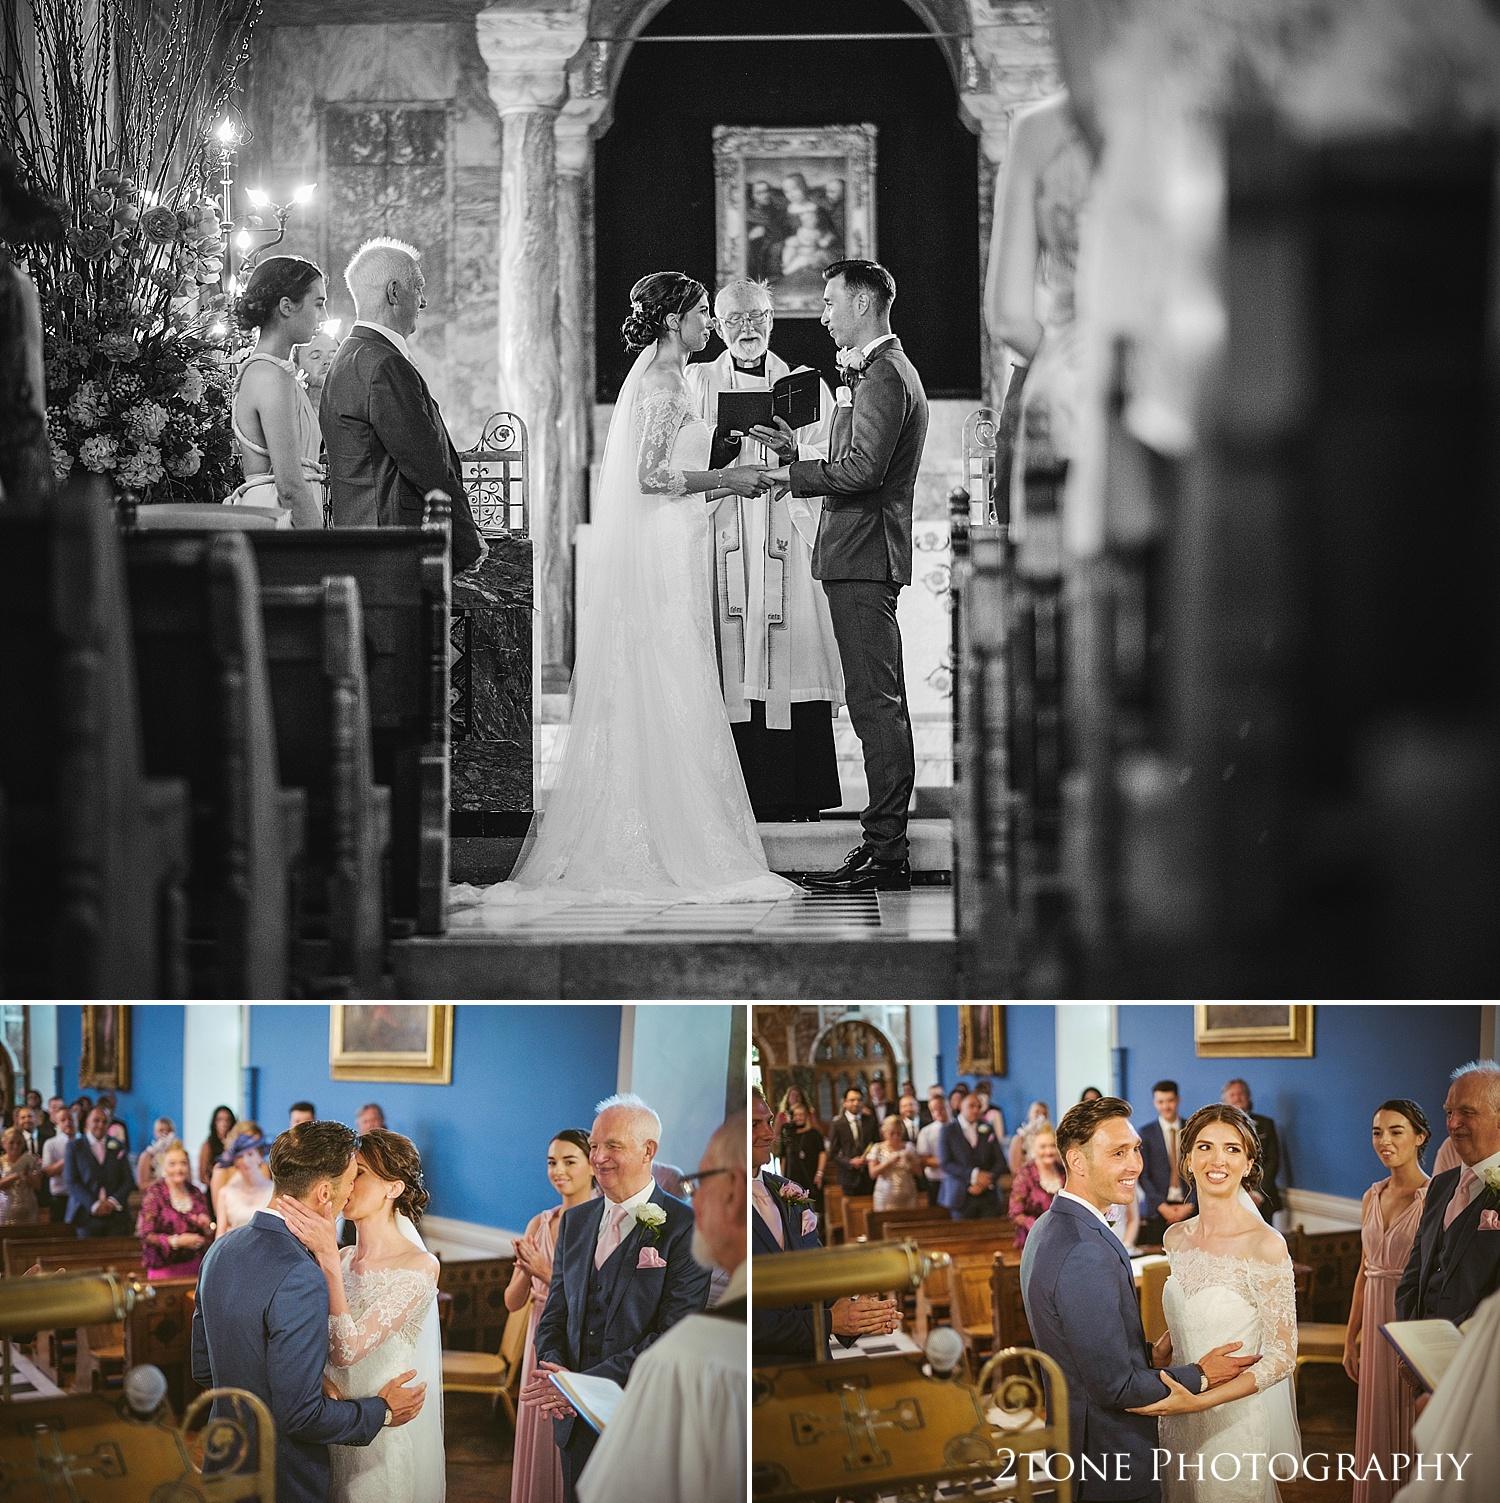 Wedding ceremony at Wynyard Hall by Durham based wedding photographers www.2tonephotography.co.uk